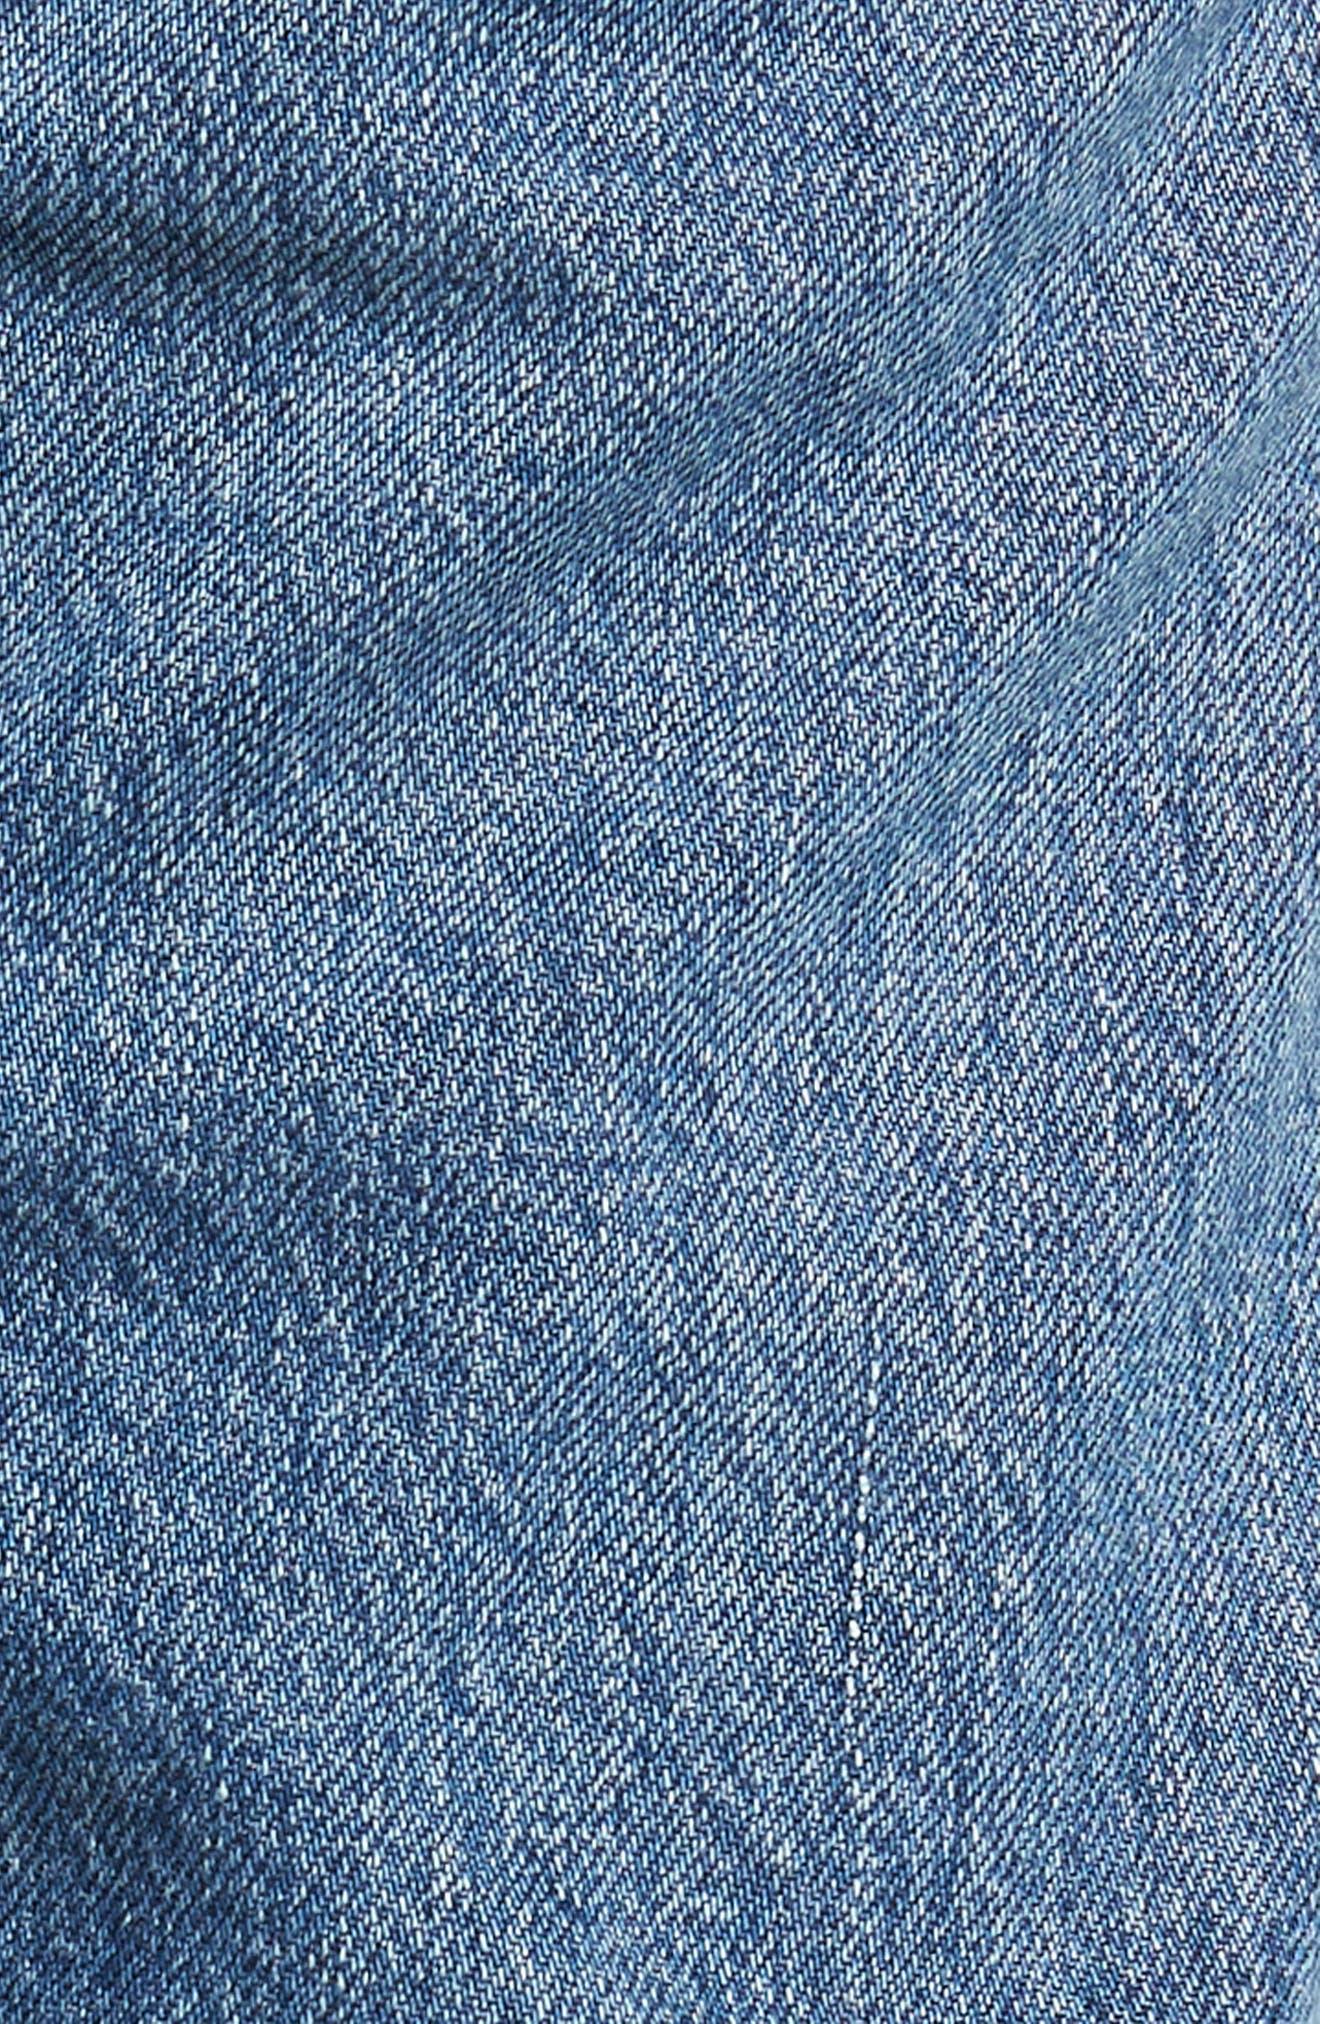 Liya High Waist Slim Boyfriend Jeans,                             Alternate thumbnail 6, color,                             Admire